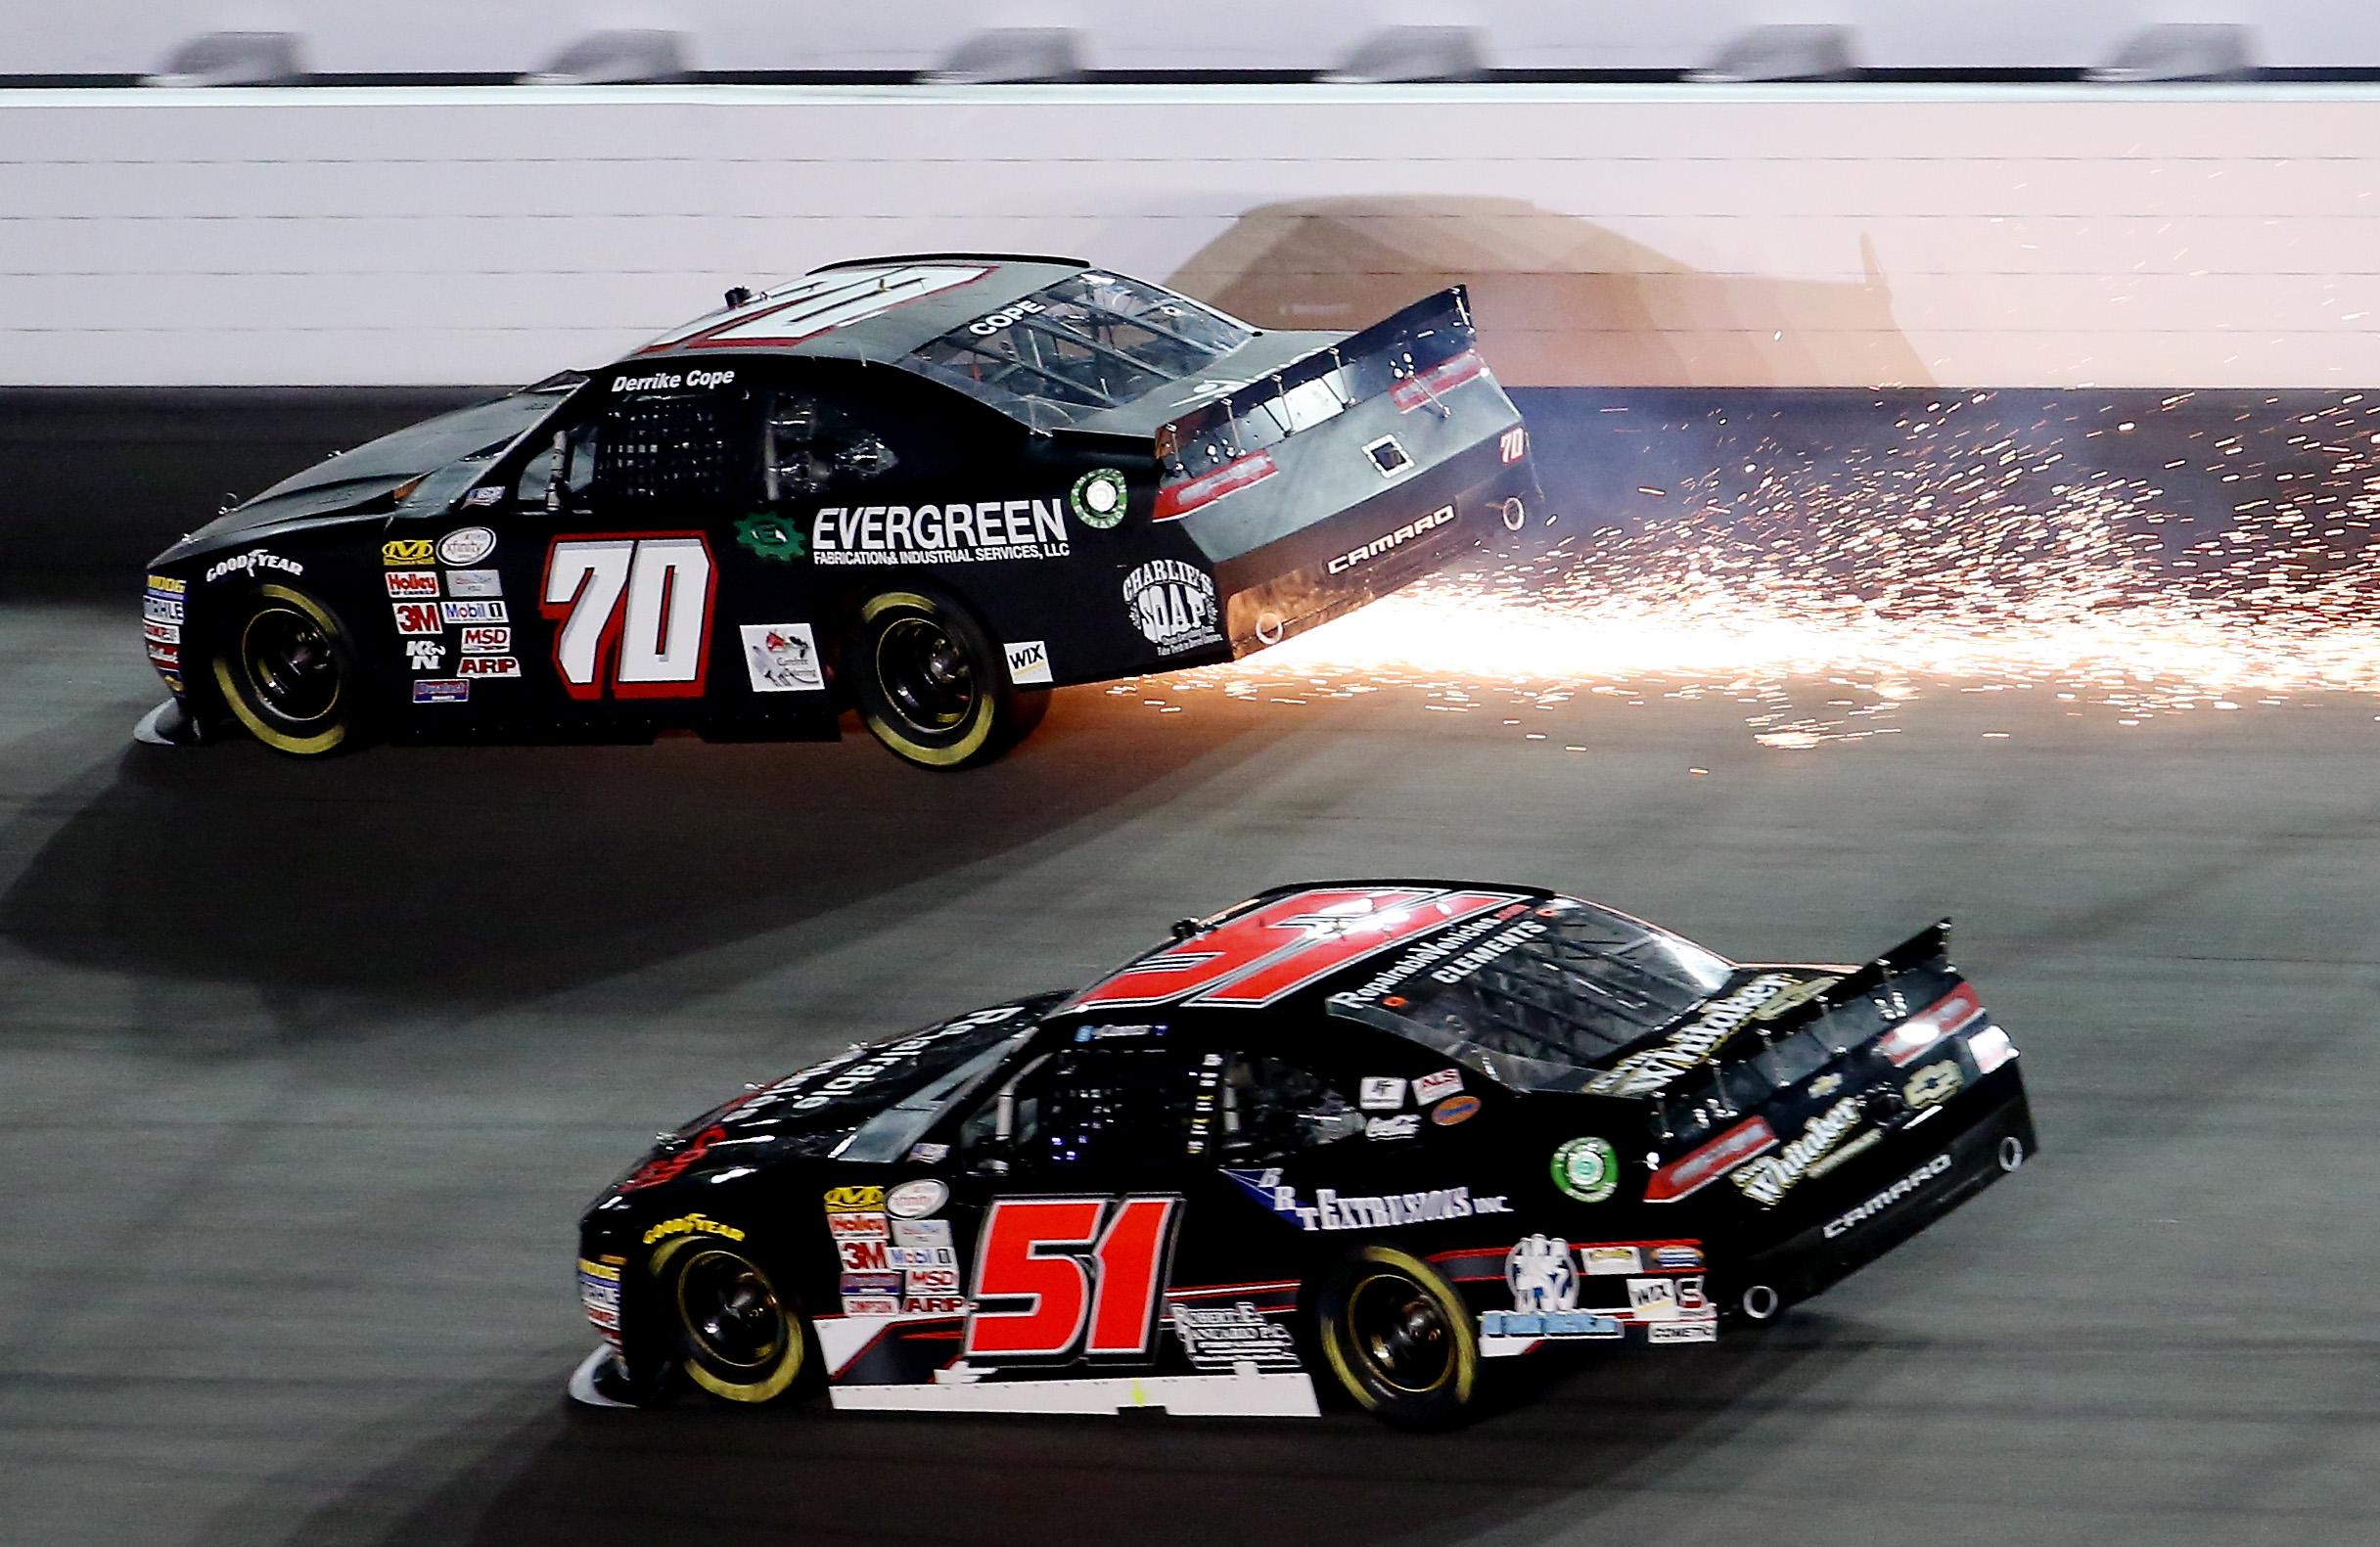 NASCAR XFINITY Series 2017 drivers and teams